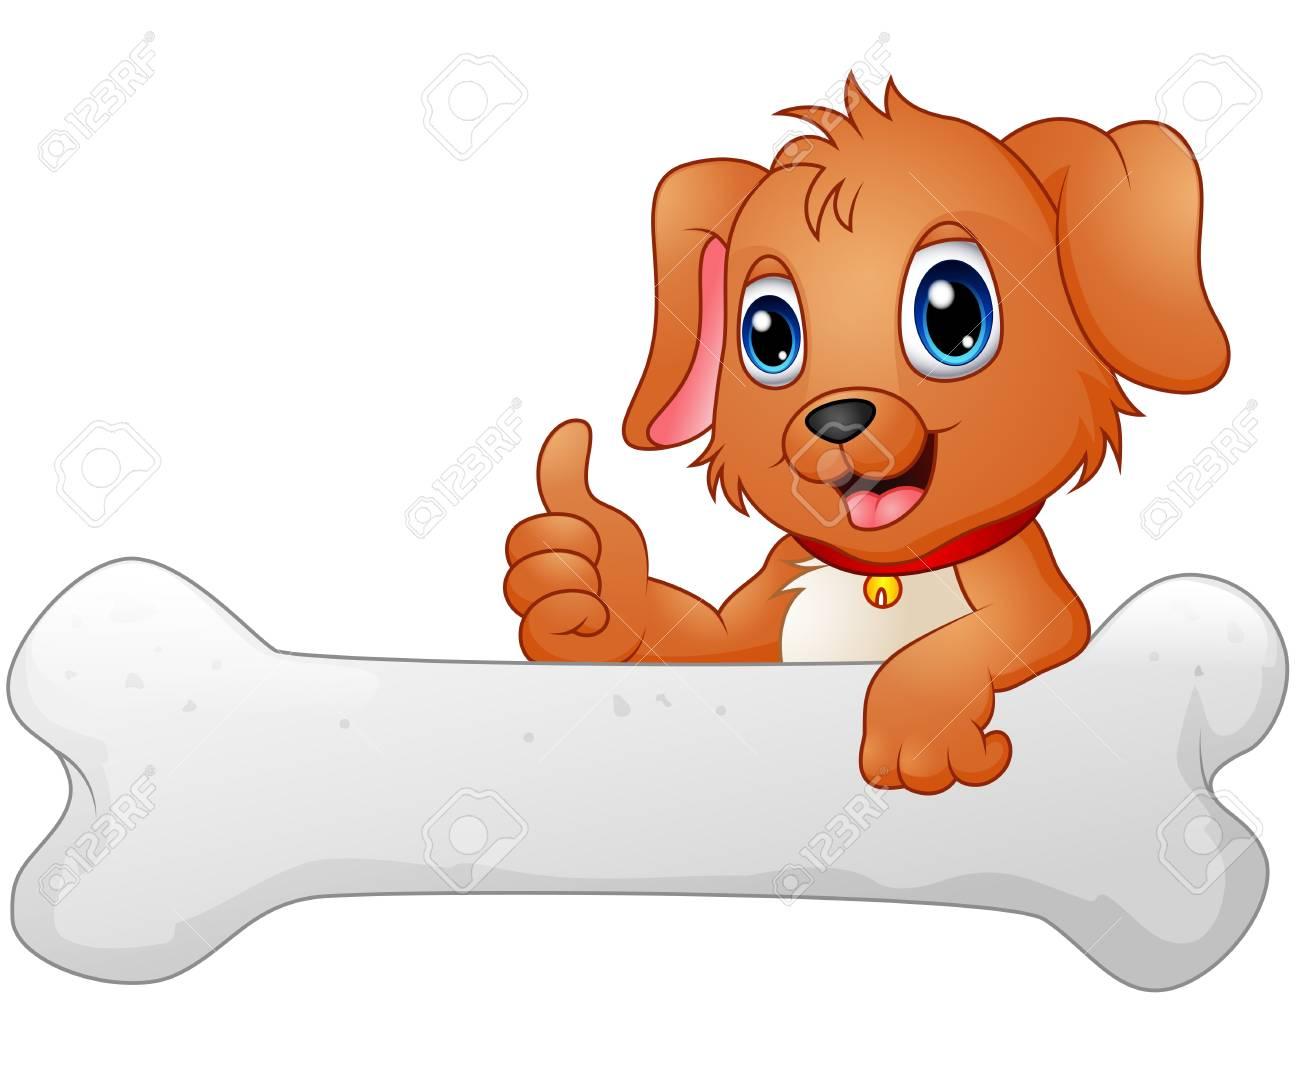 Cute dog with holding bone.